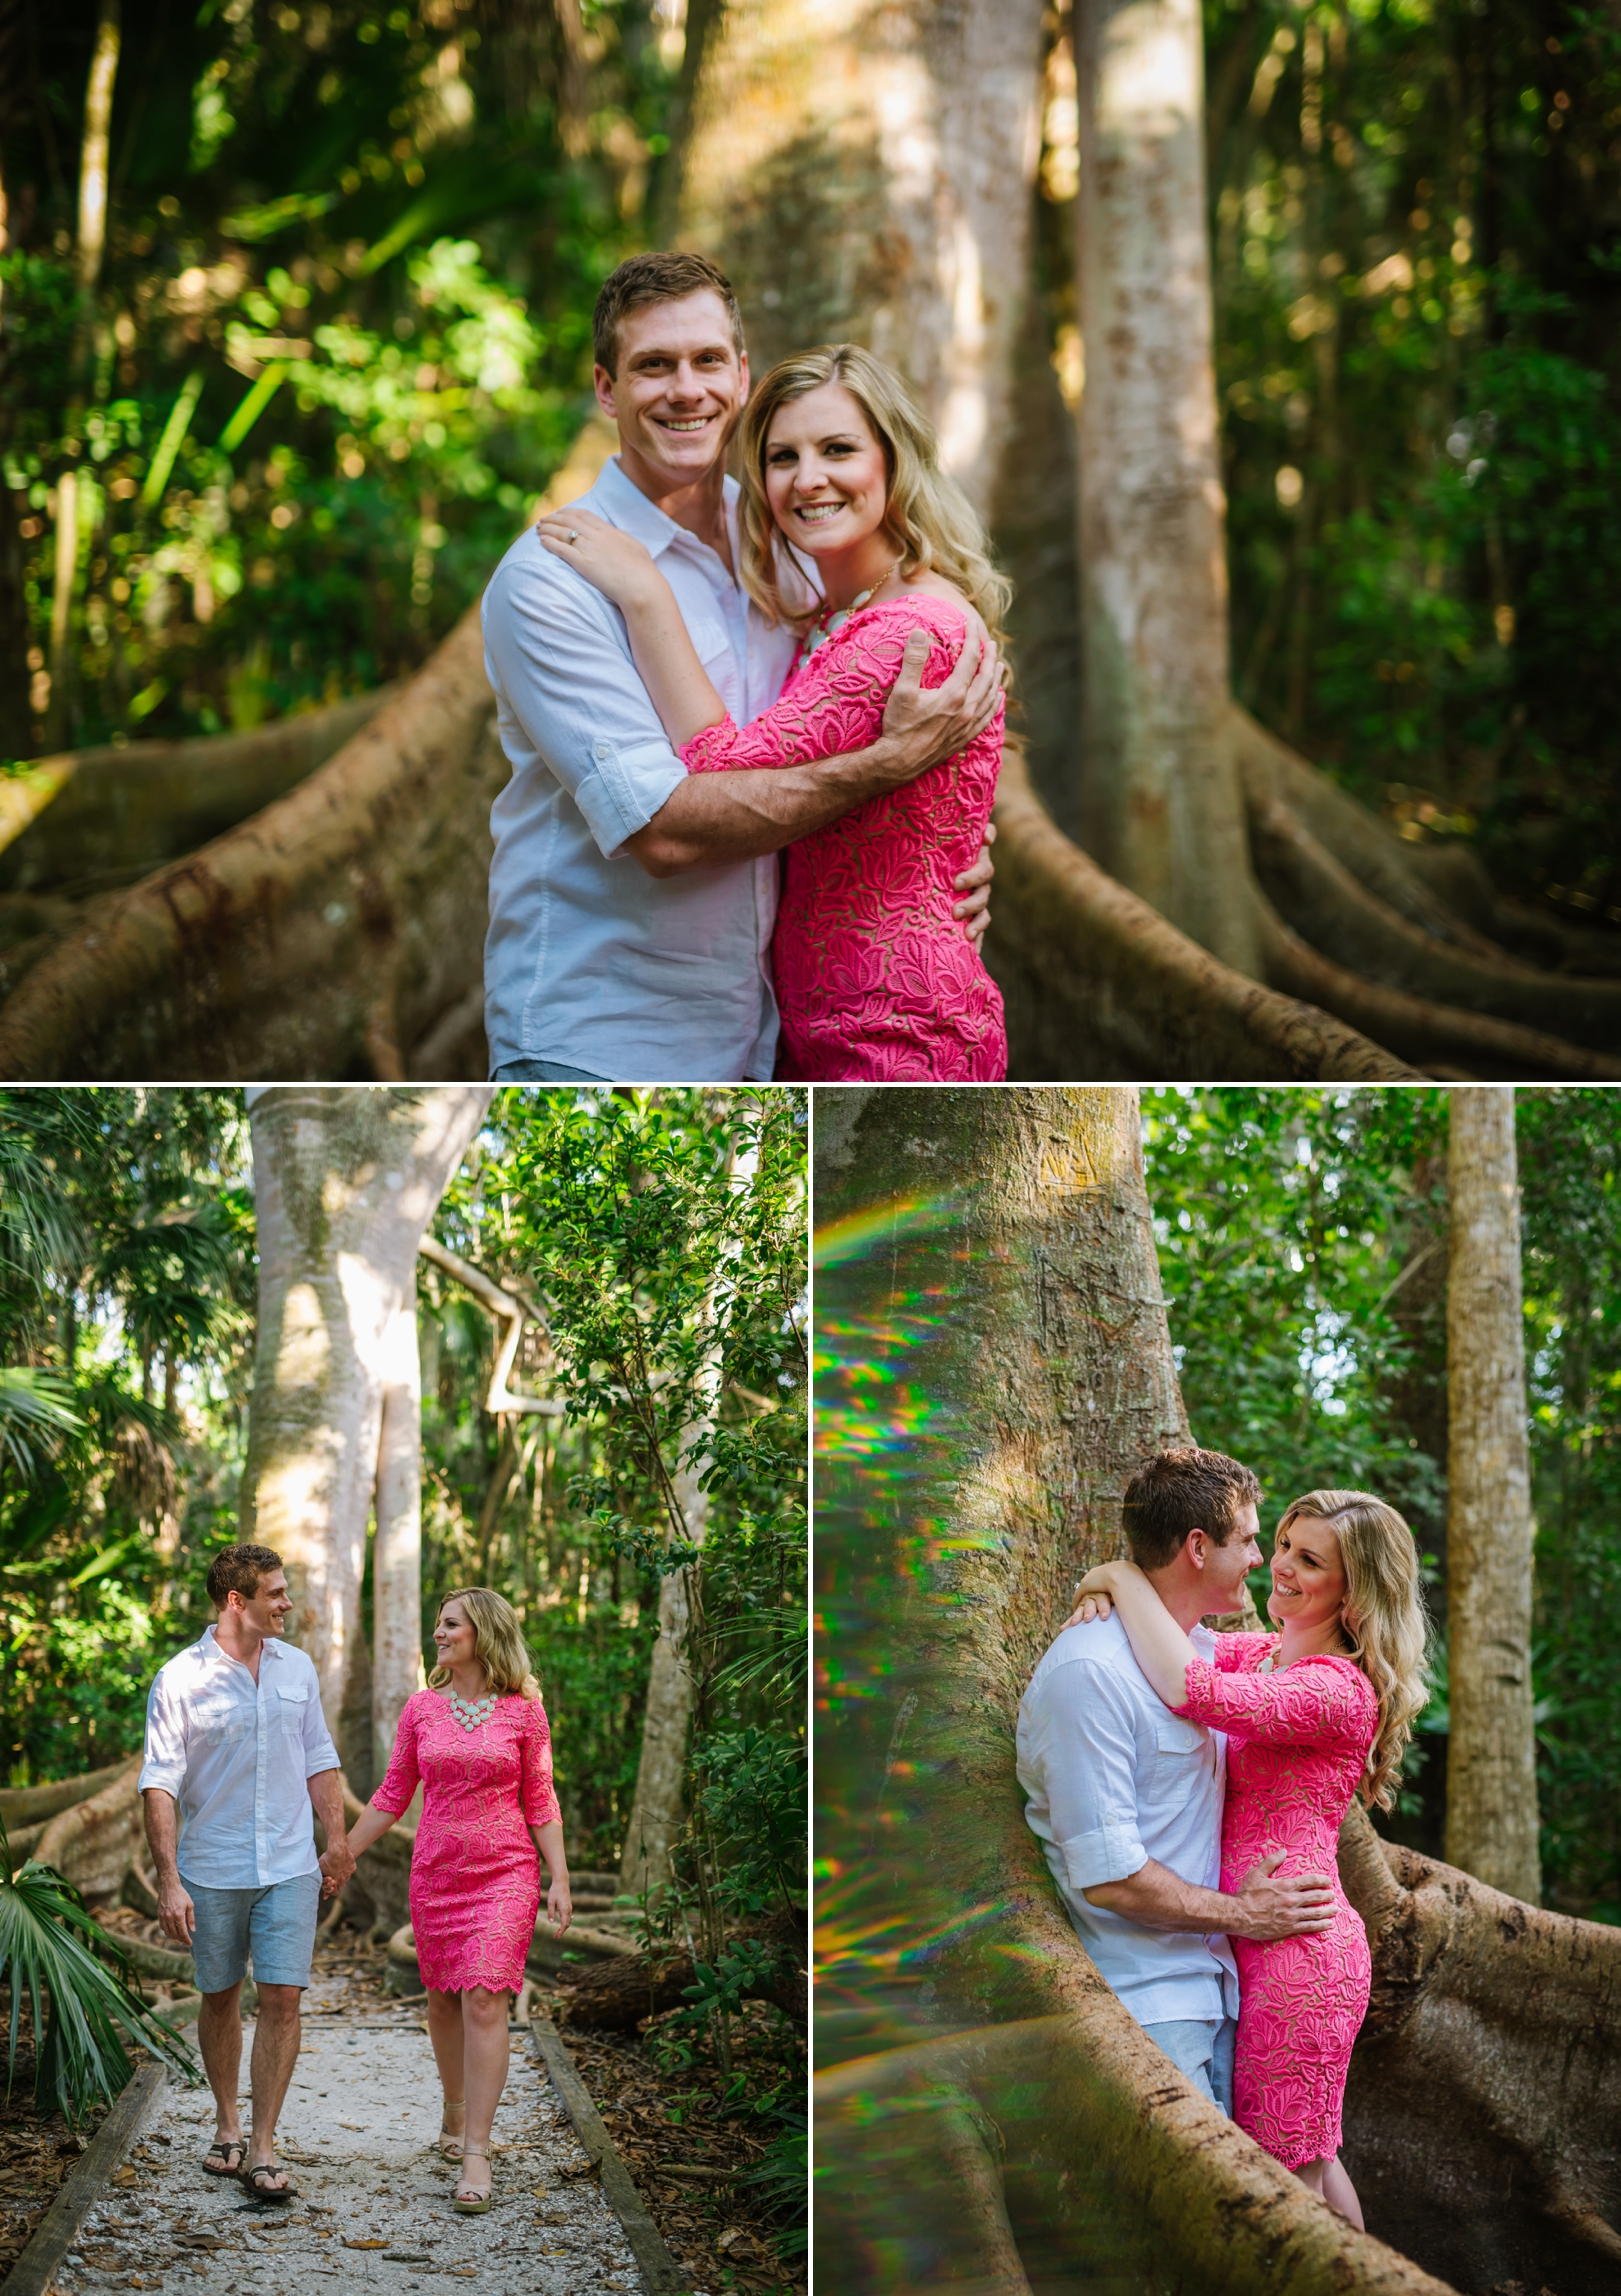 tampa-wedding-photographer-engagement-nature-outdoor-florida_0001.jpg